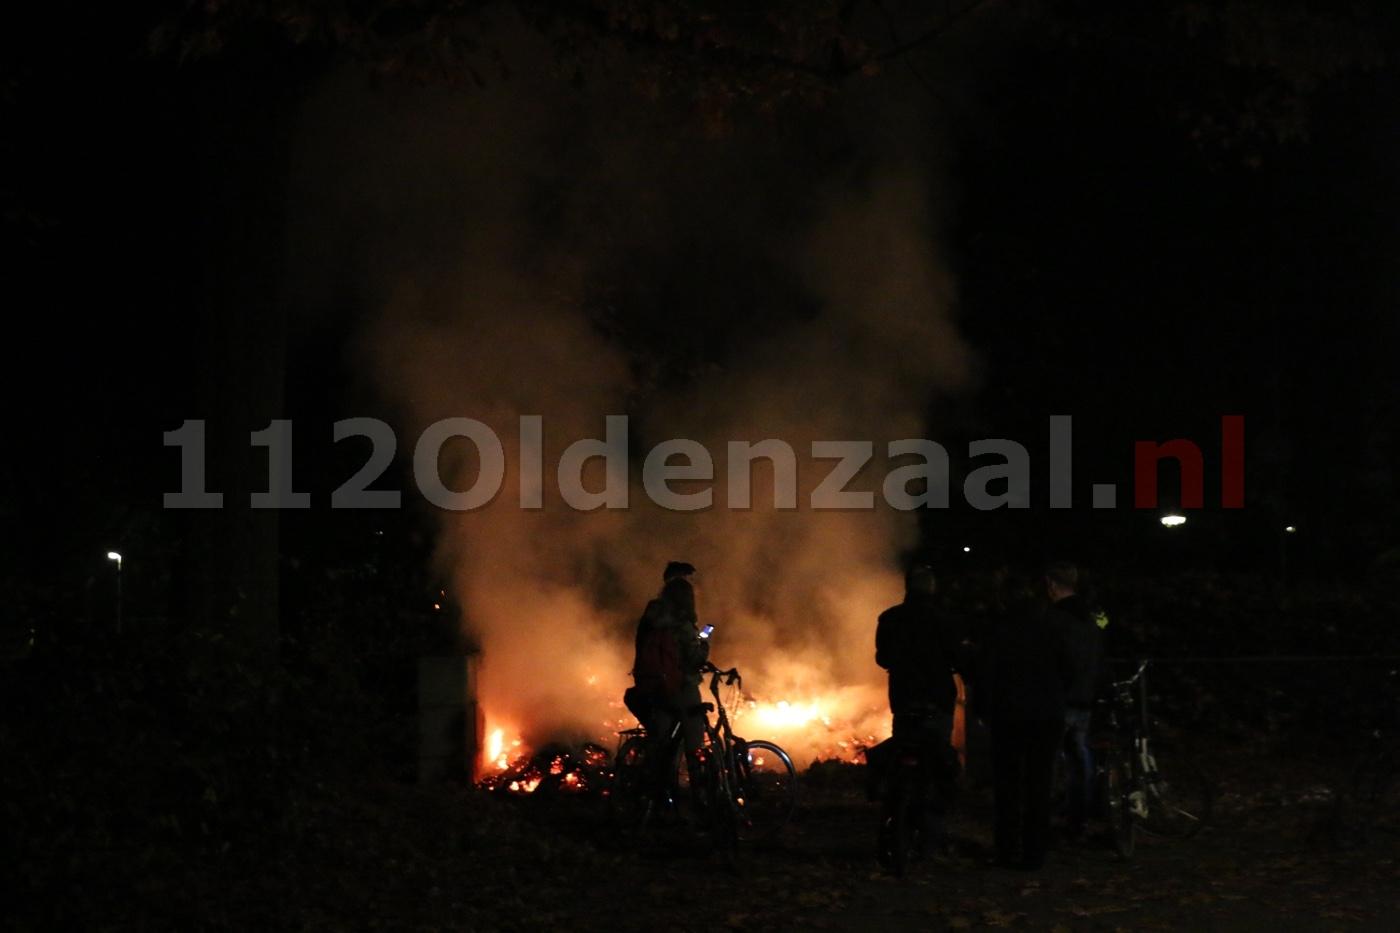 Brandweer rukt uit voor brandend bladafval in Oldenzaal